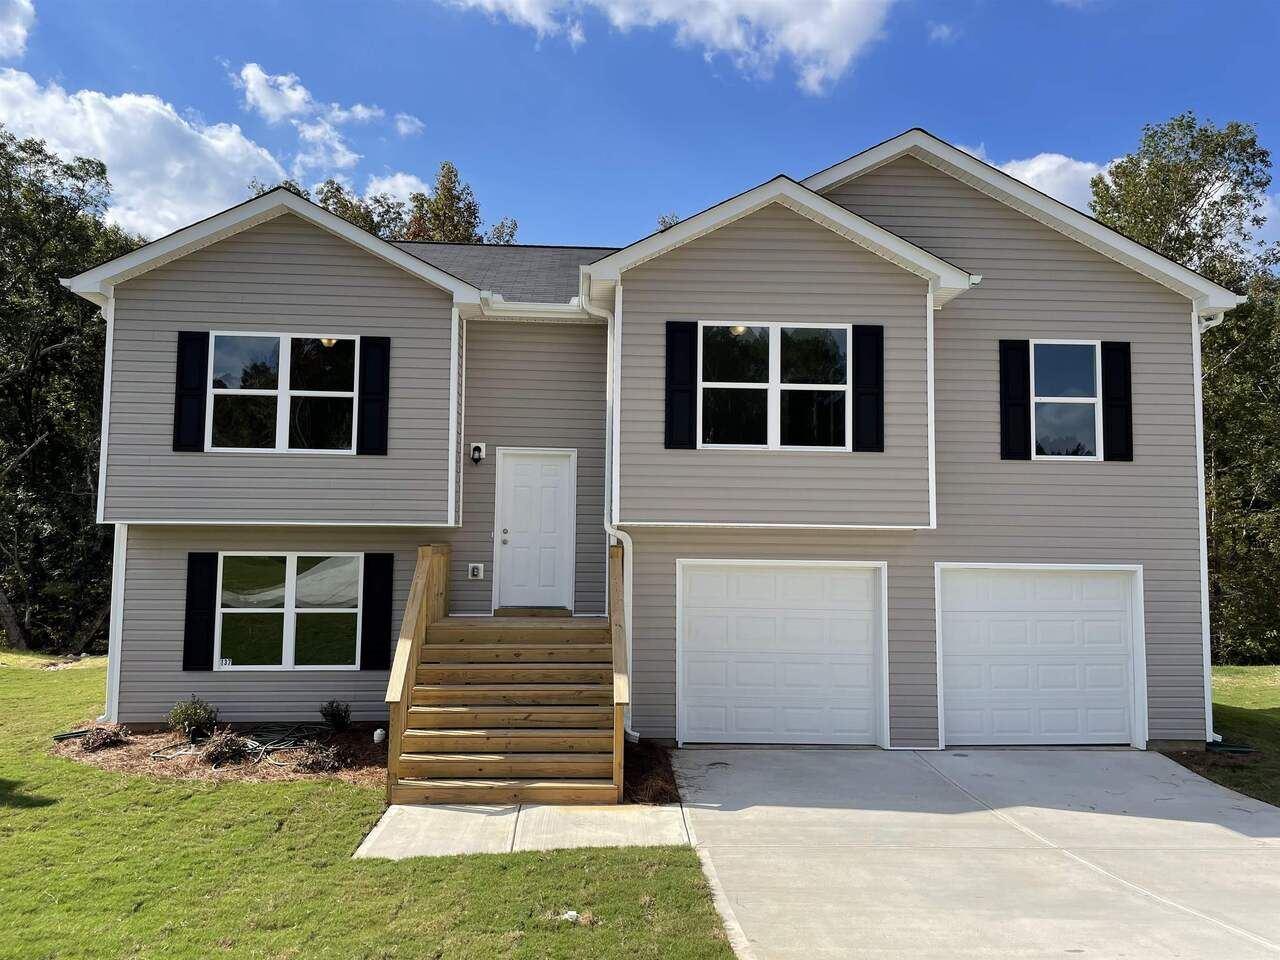 137 Misty Grove Lane #LOT 18, Eatonton, GA 31024 - MLS#: 9002995